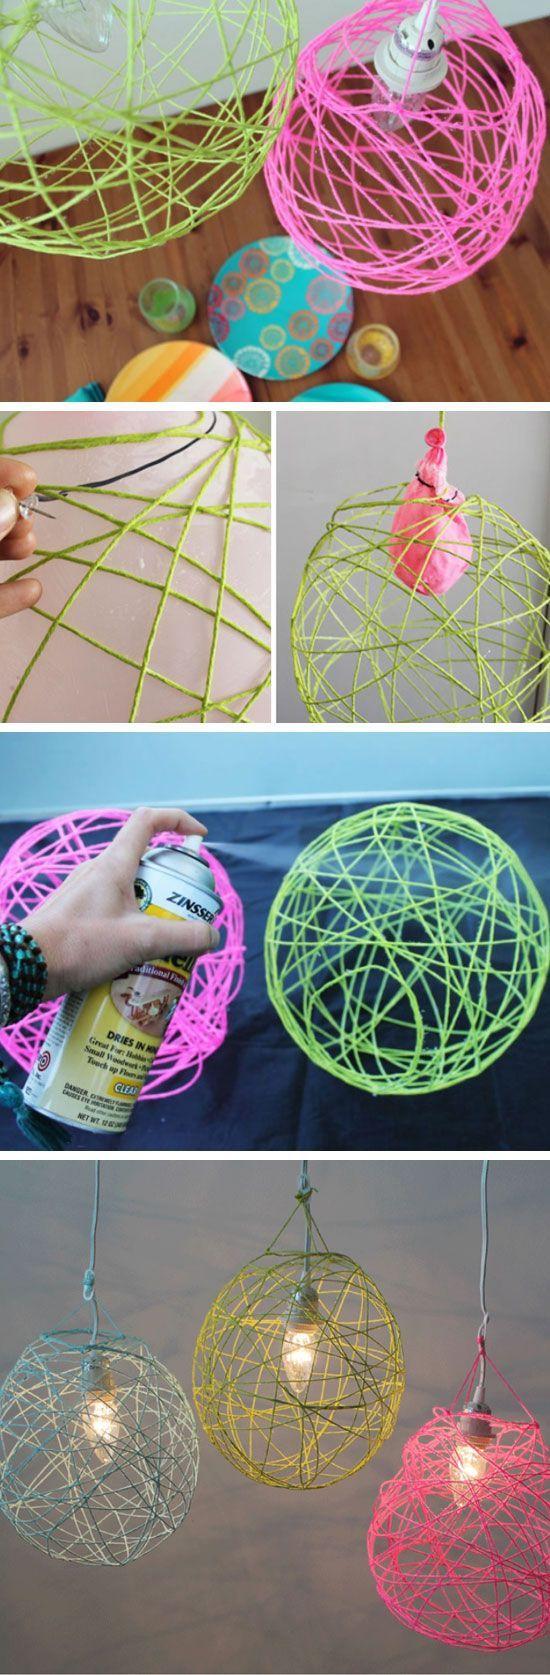 innovative girls bedroom decorating ideas   Illuminated Yarn Lanterns   24 DIY Teenage Girl Bedroom ...